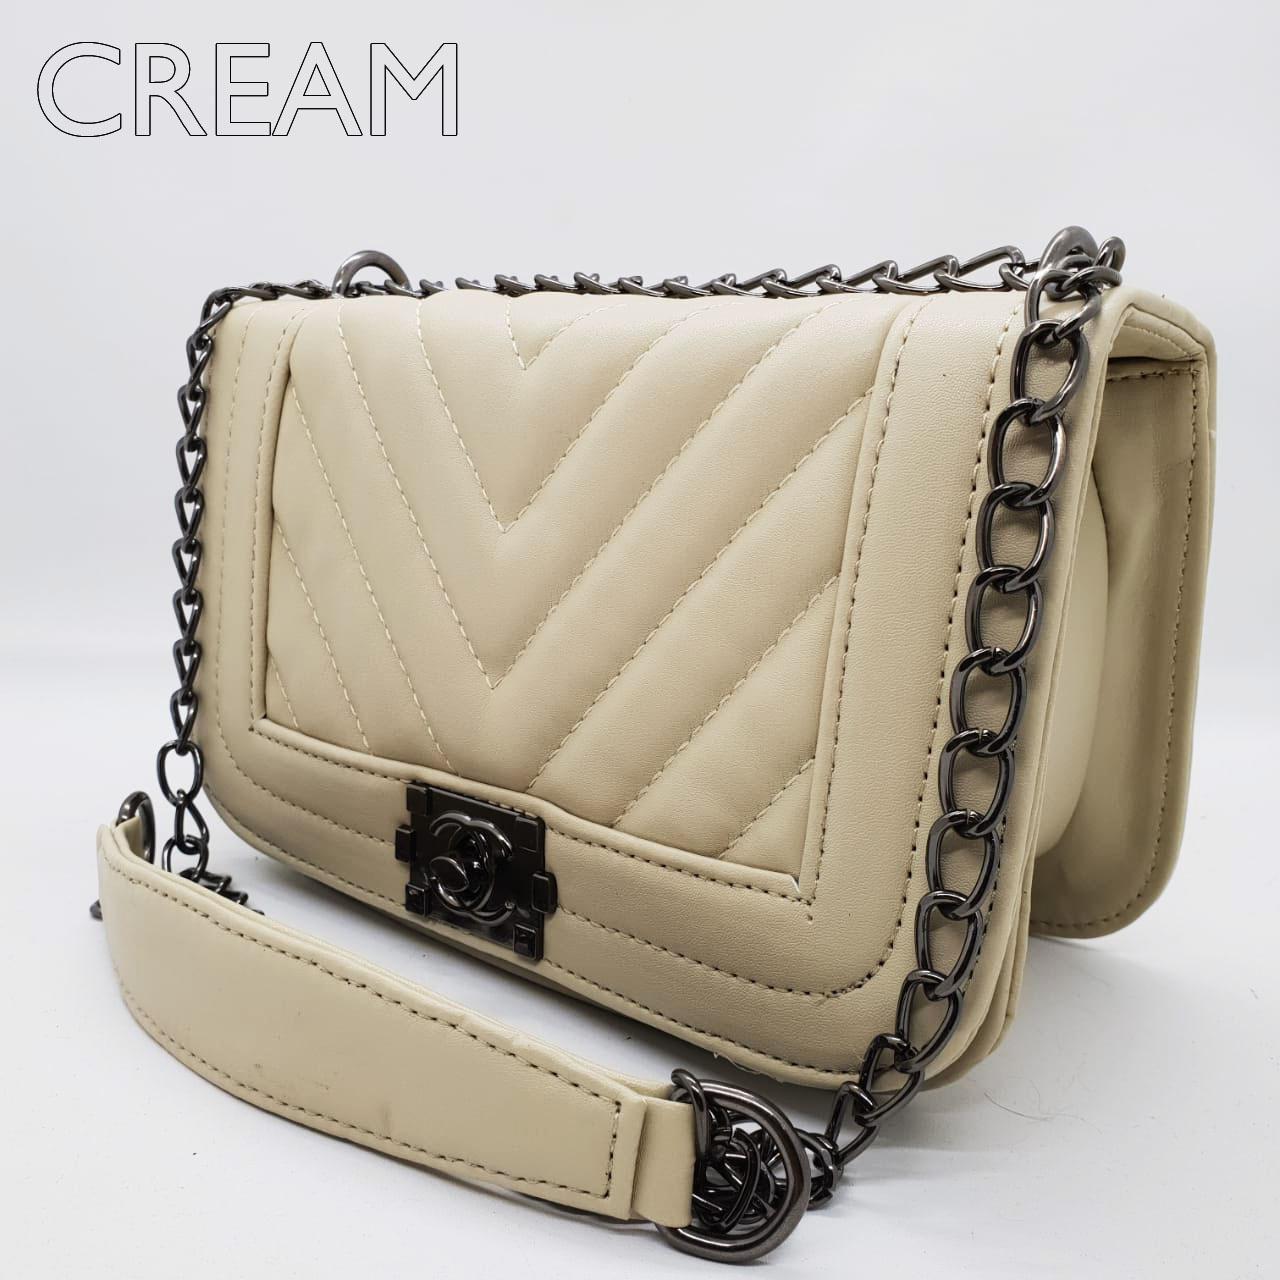 Dimana Beli Chanel Lidah Tas Import Wanita Pesta Batam Scarlet Bag Hijau  Korea Murah Selempang Modern Fashion Hand